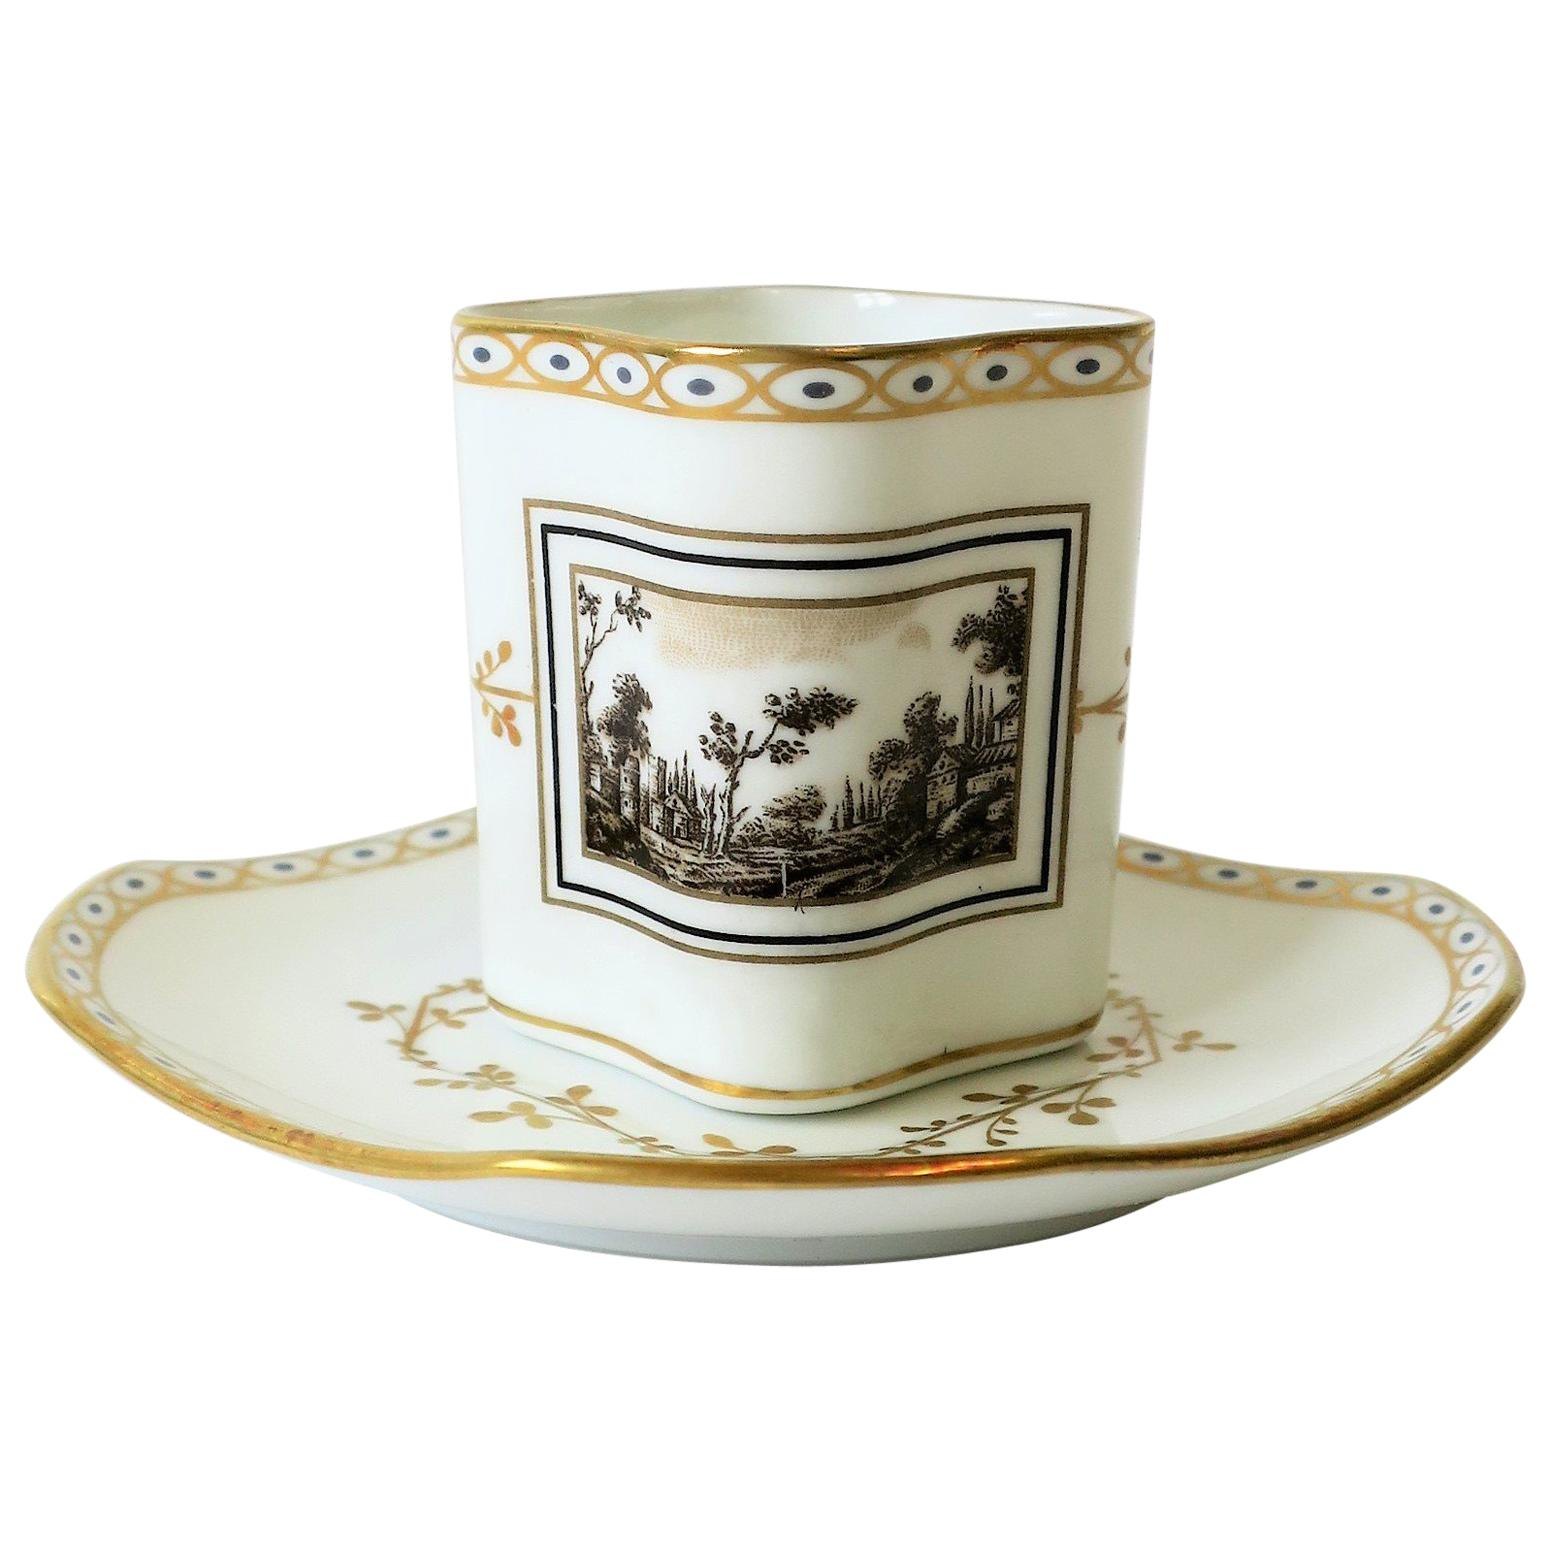 Richard Ginori Designer Italian White & Gold Espresso Coffee or Tea Cup Saucer